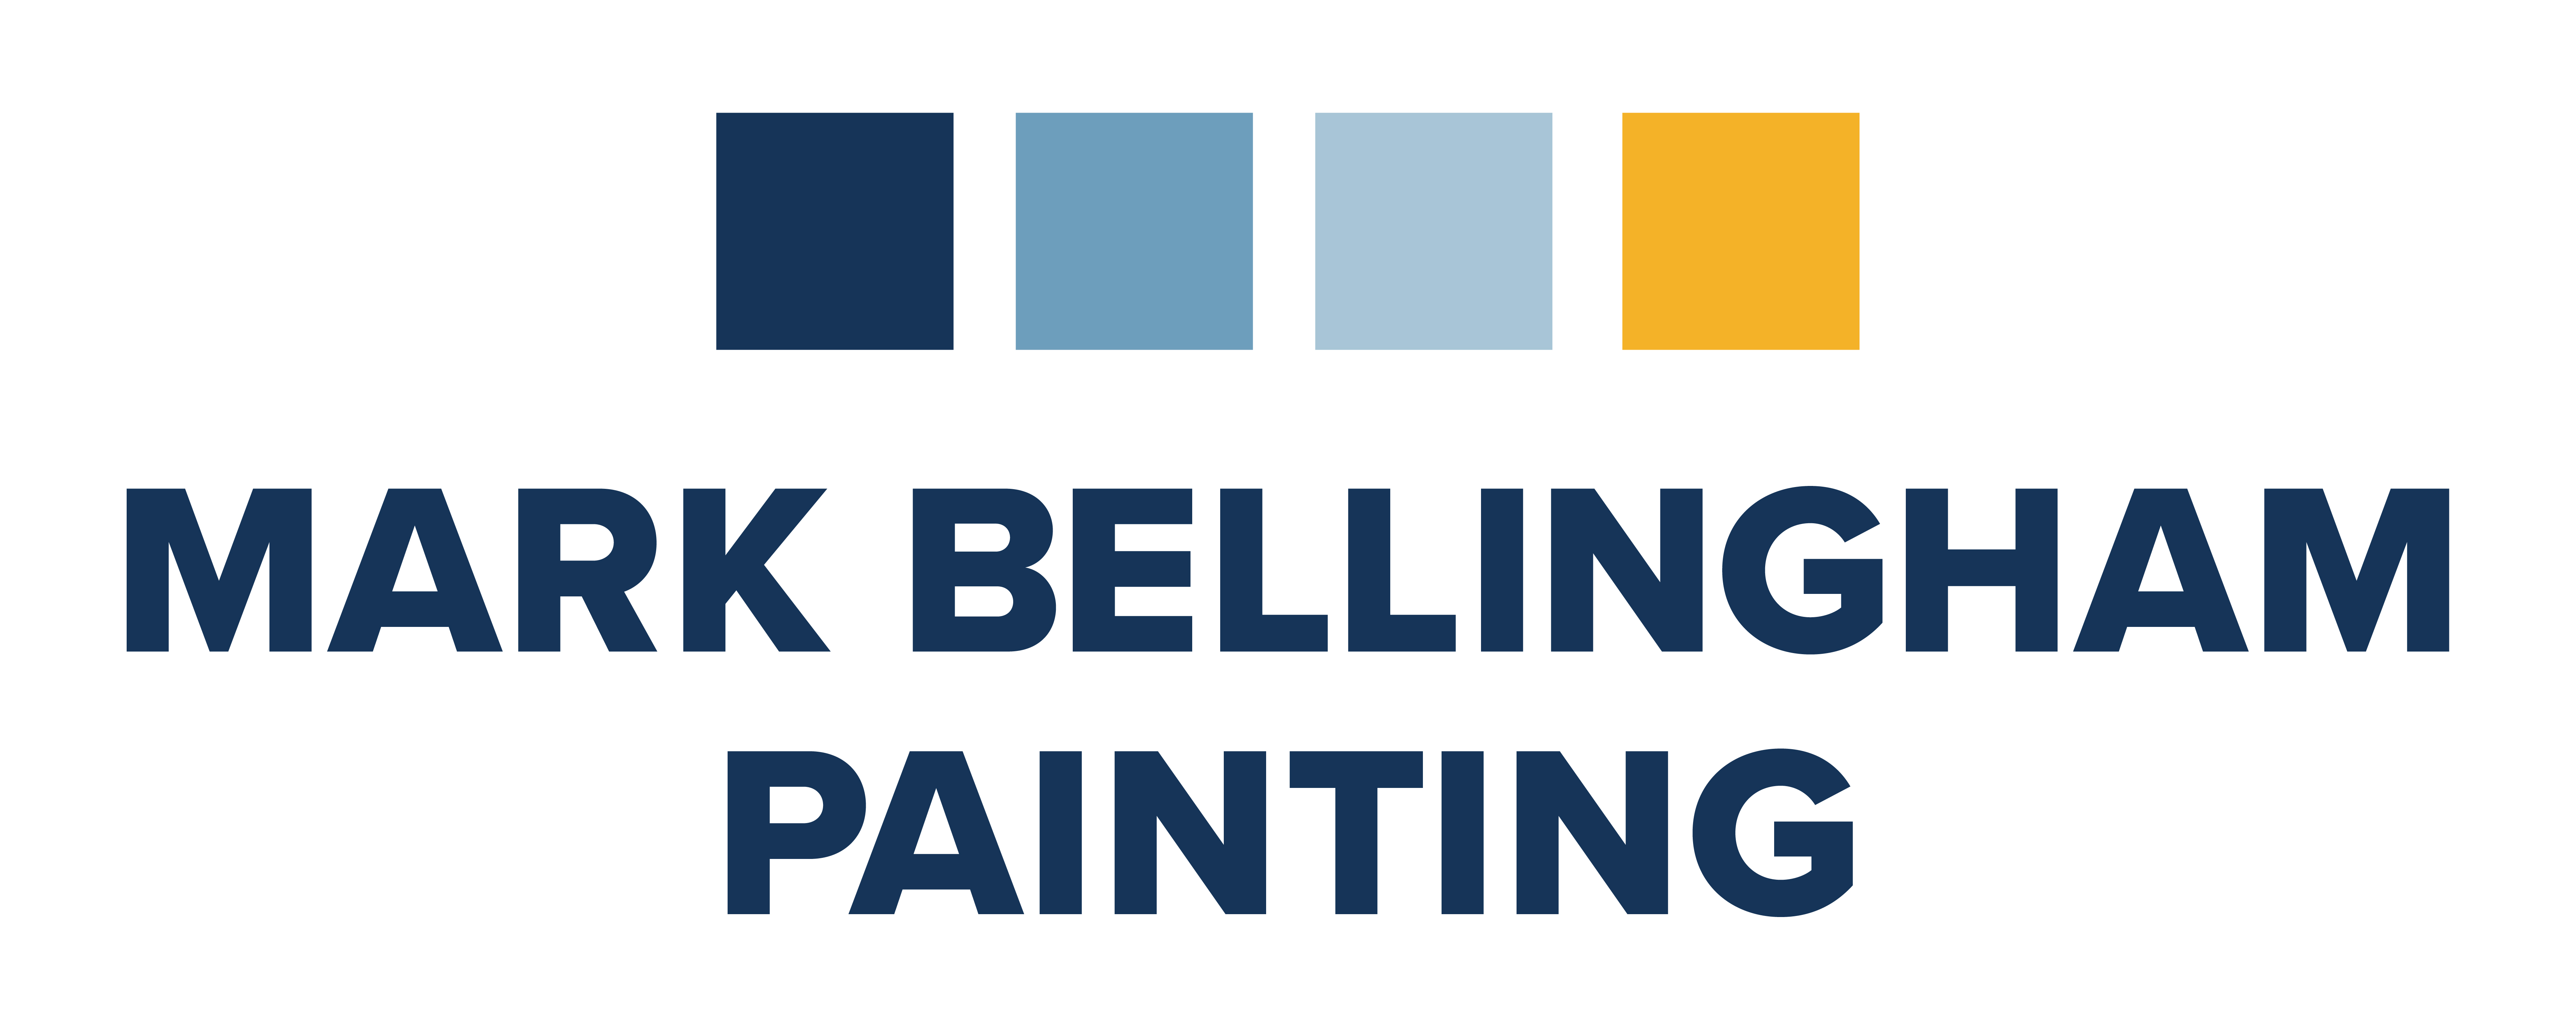 Mark Bellingham Painting